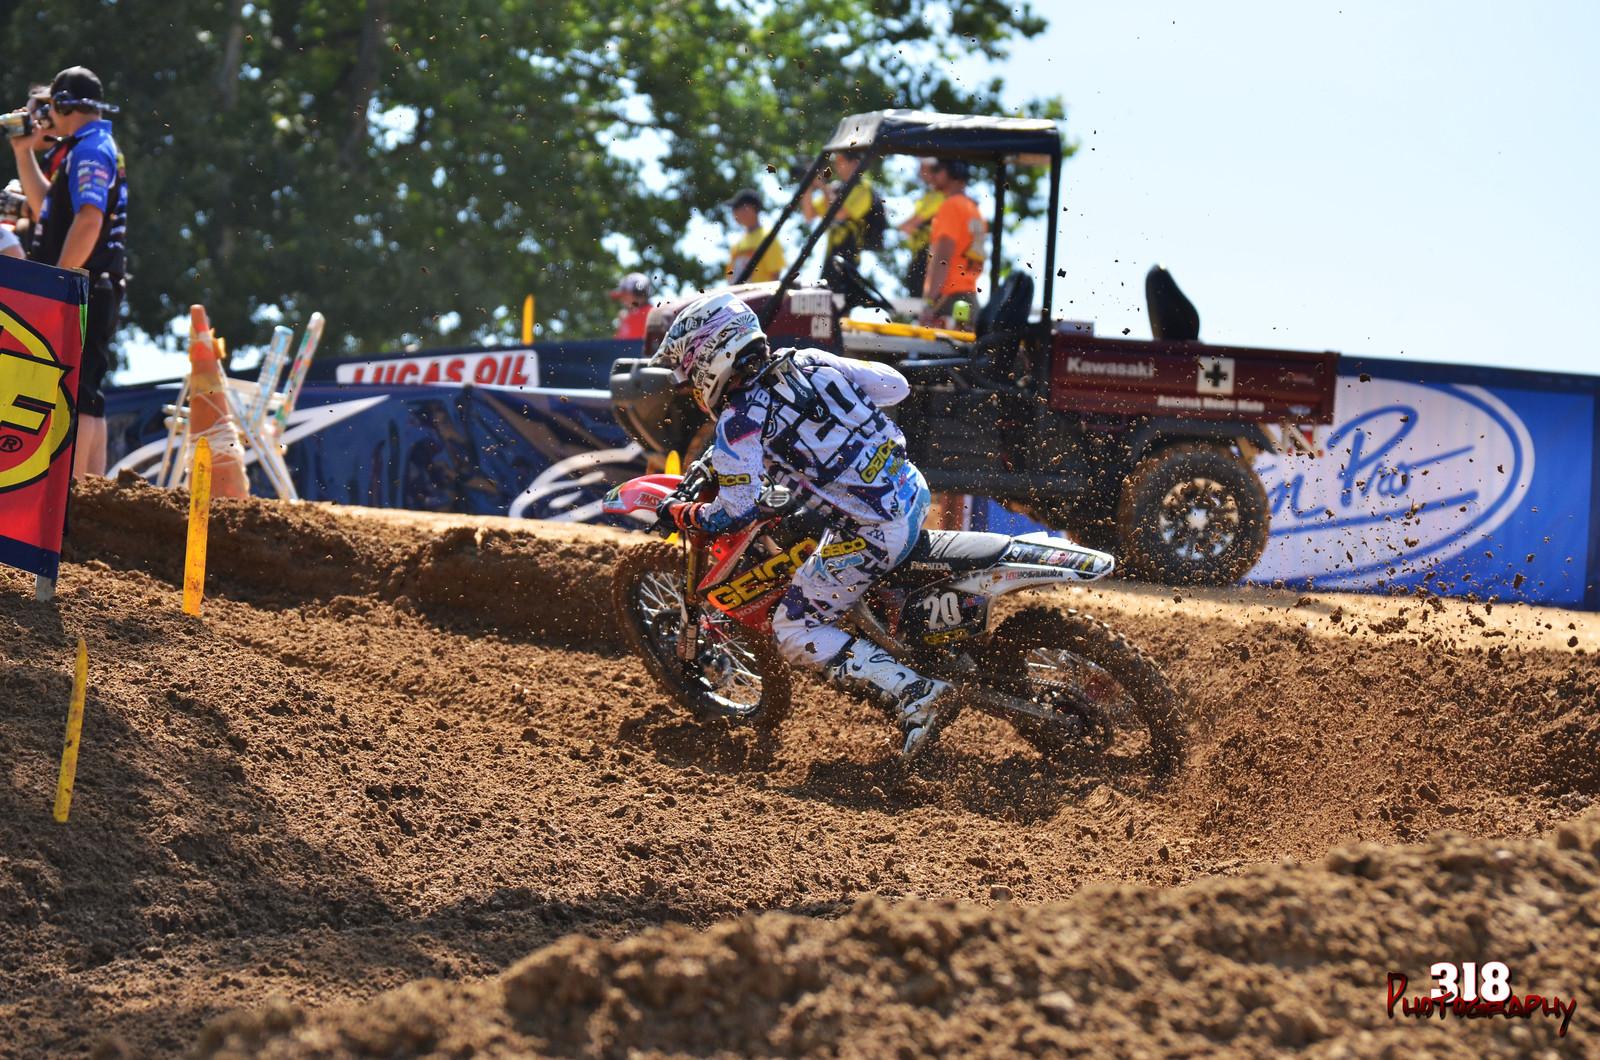 20-01 - MxPro318 - Motocross Pictures - Vital MX